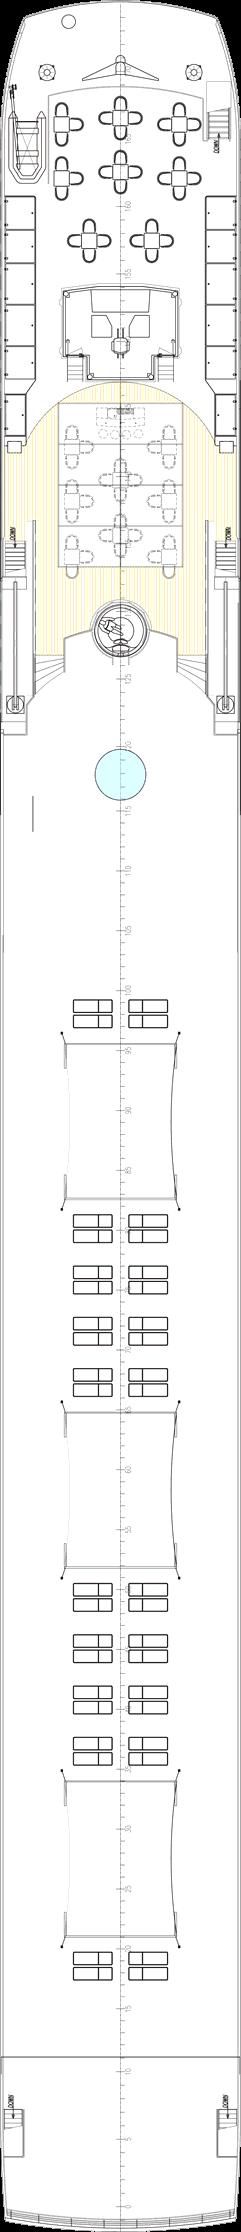 Avalon Artistry II: Sky Deck